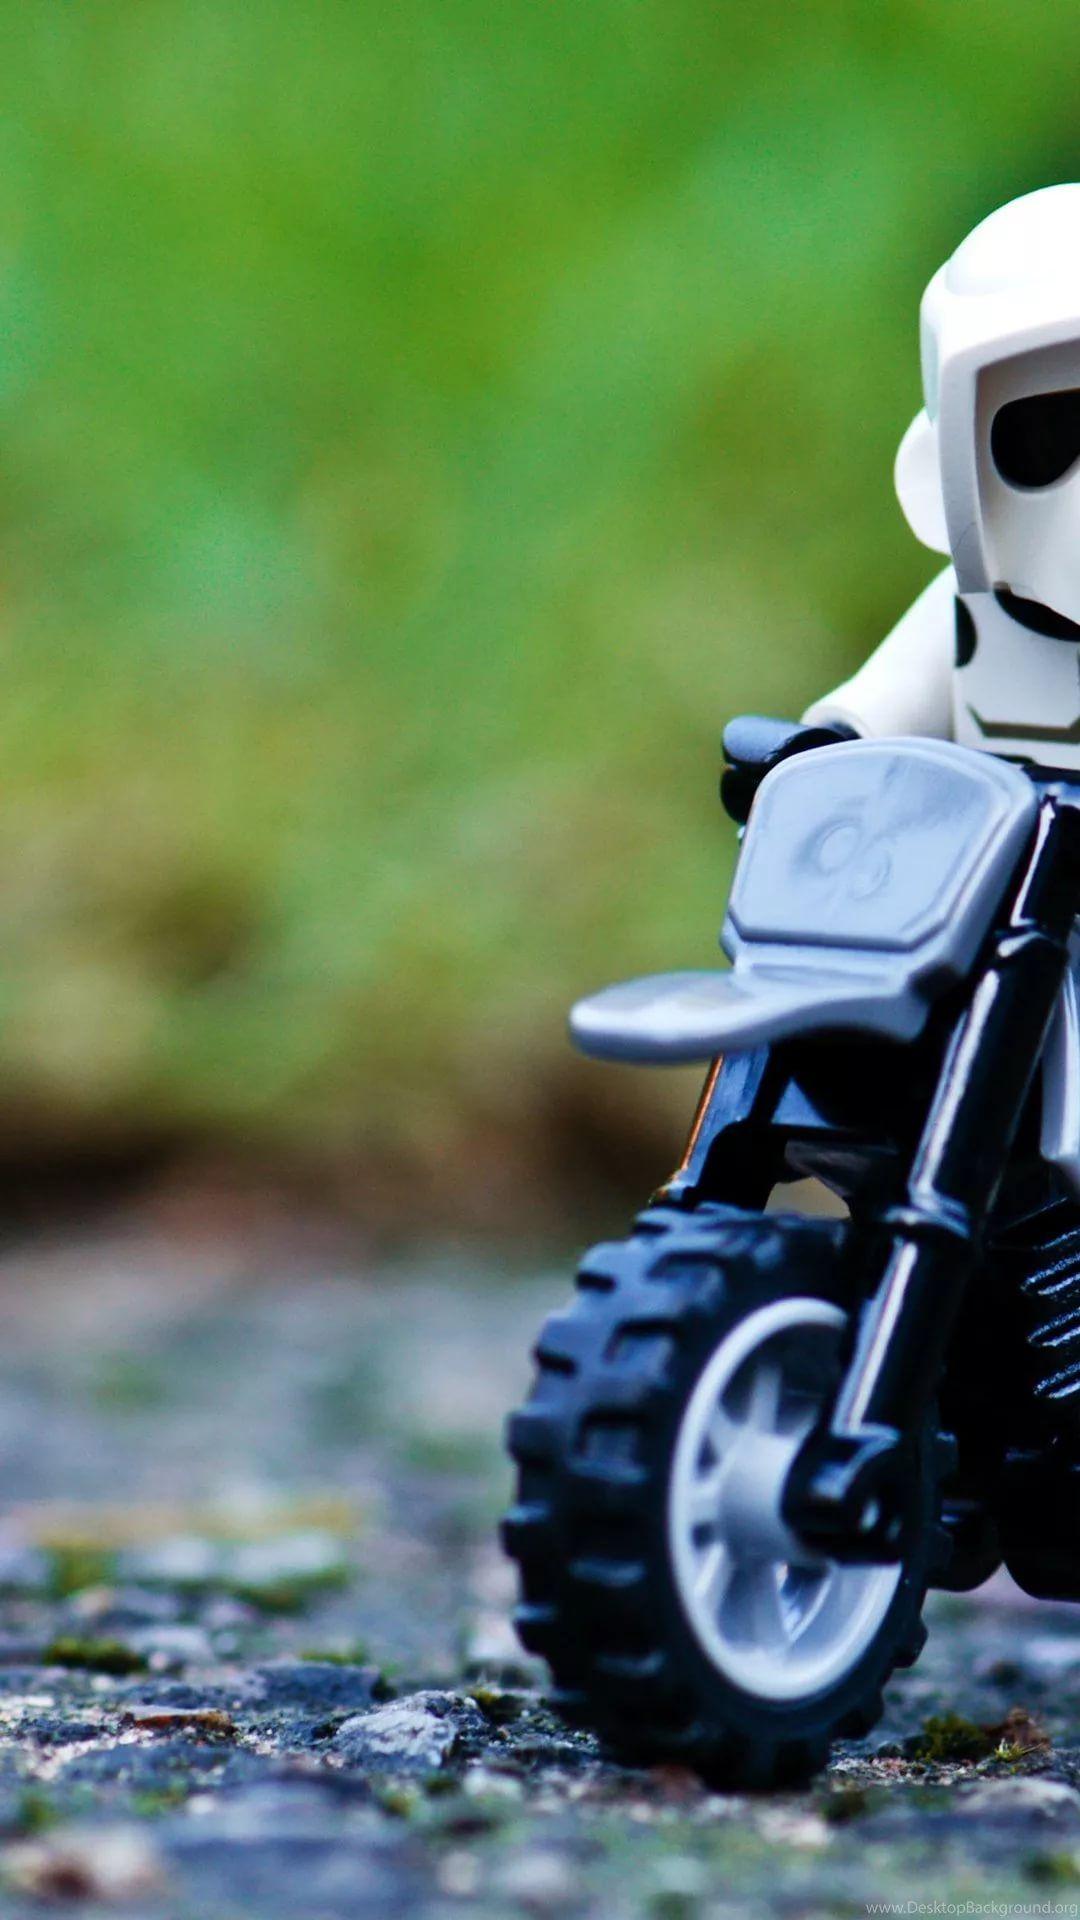 Lego Star Wars phone background